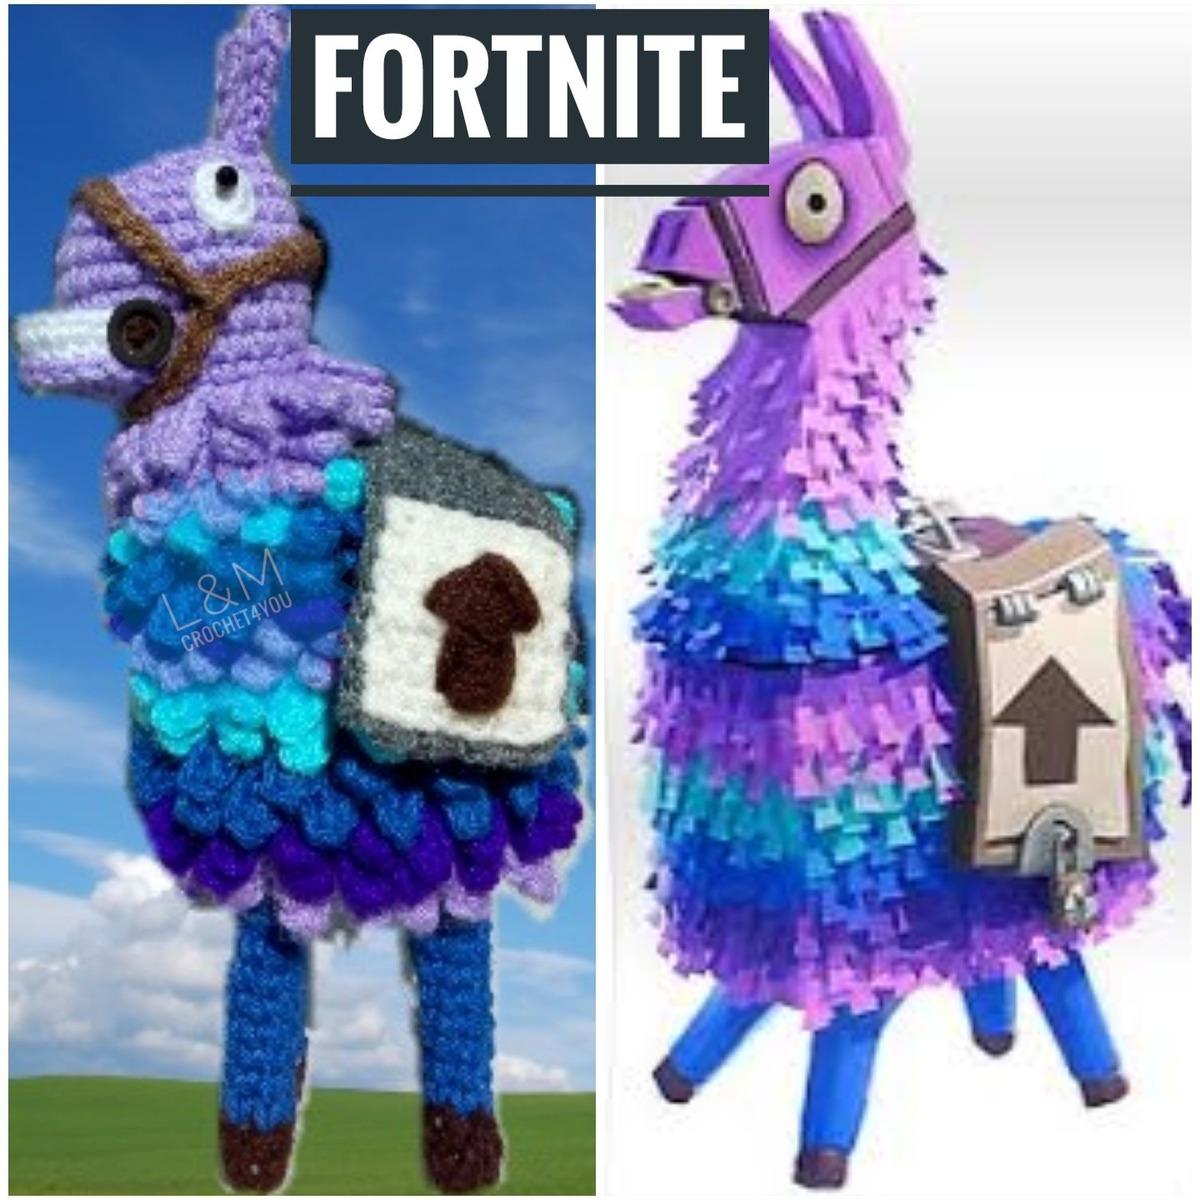 Fortnite Llama Piñata Tomate Amigurumi Crochet Muñeco Decarl ... | 1200x1200